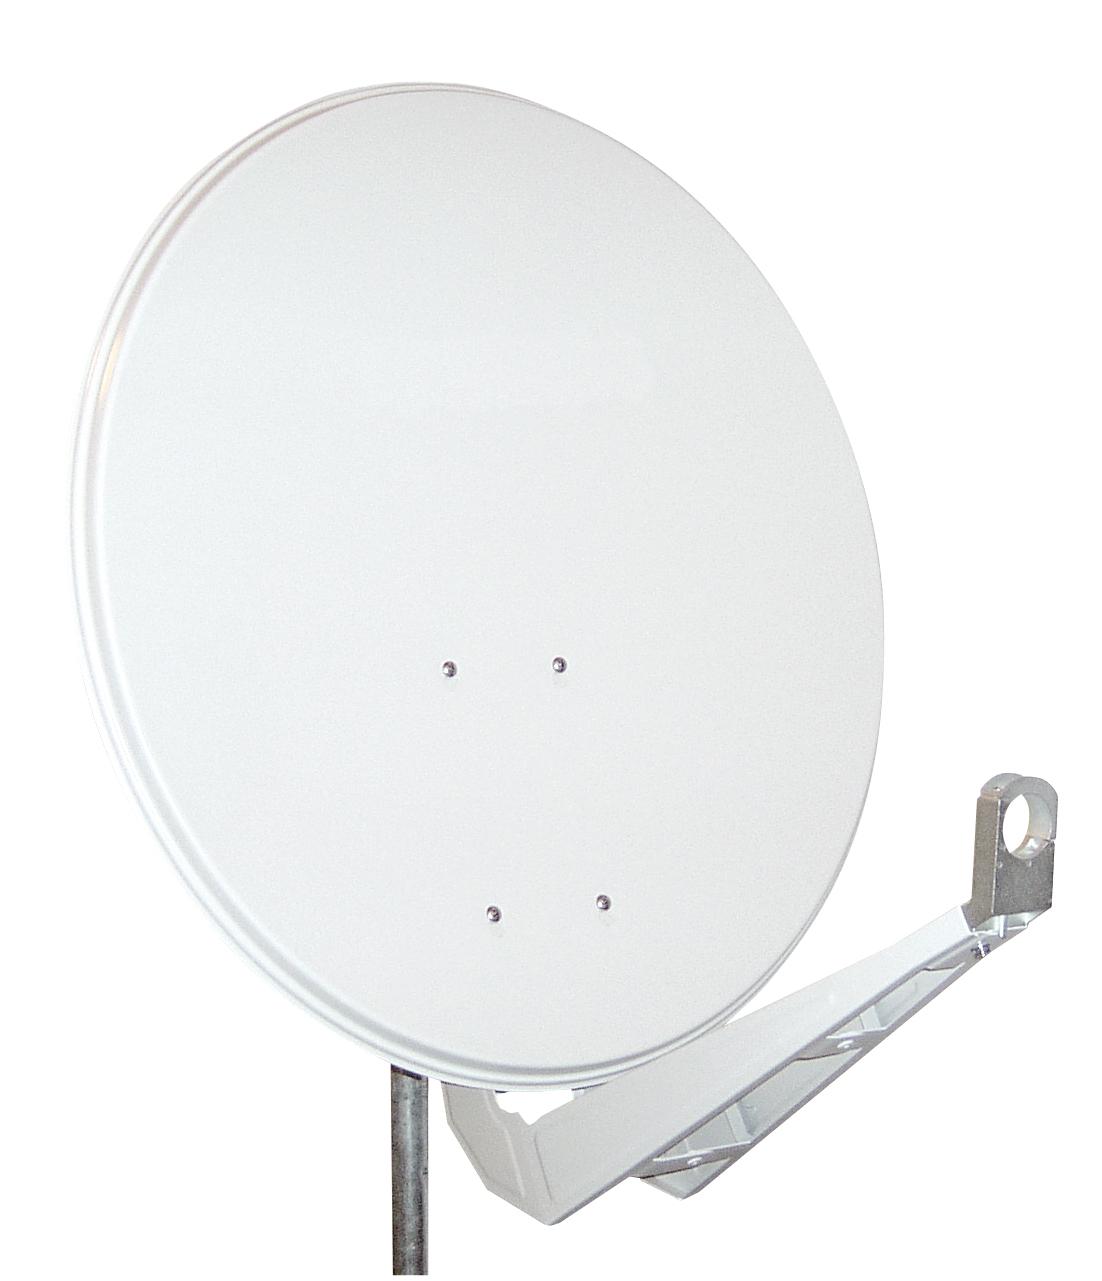 1 Stk SAT Antenne  85/80cm,Alu,40dB Gain,Doppel Monoblock Arm,Weiß HSATA085AW